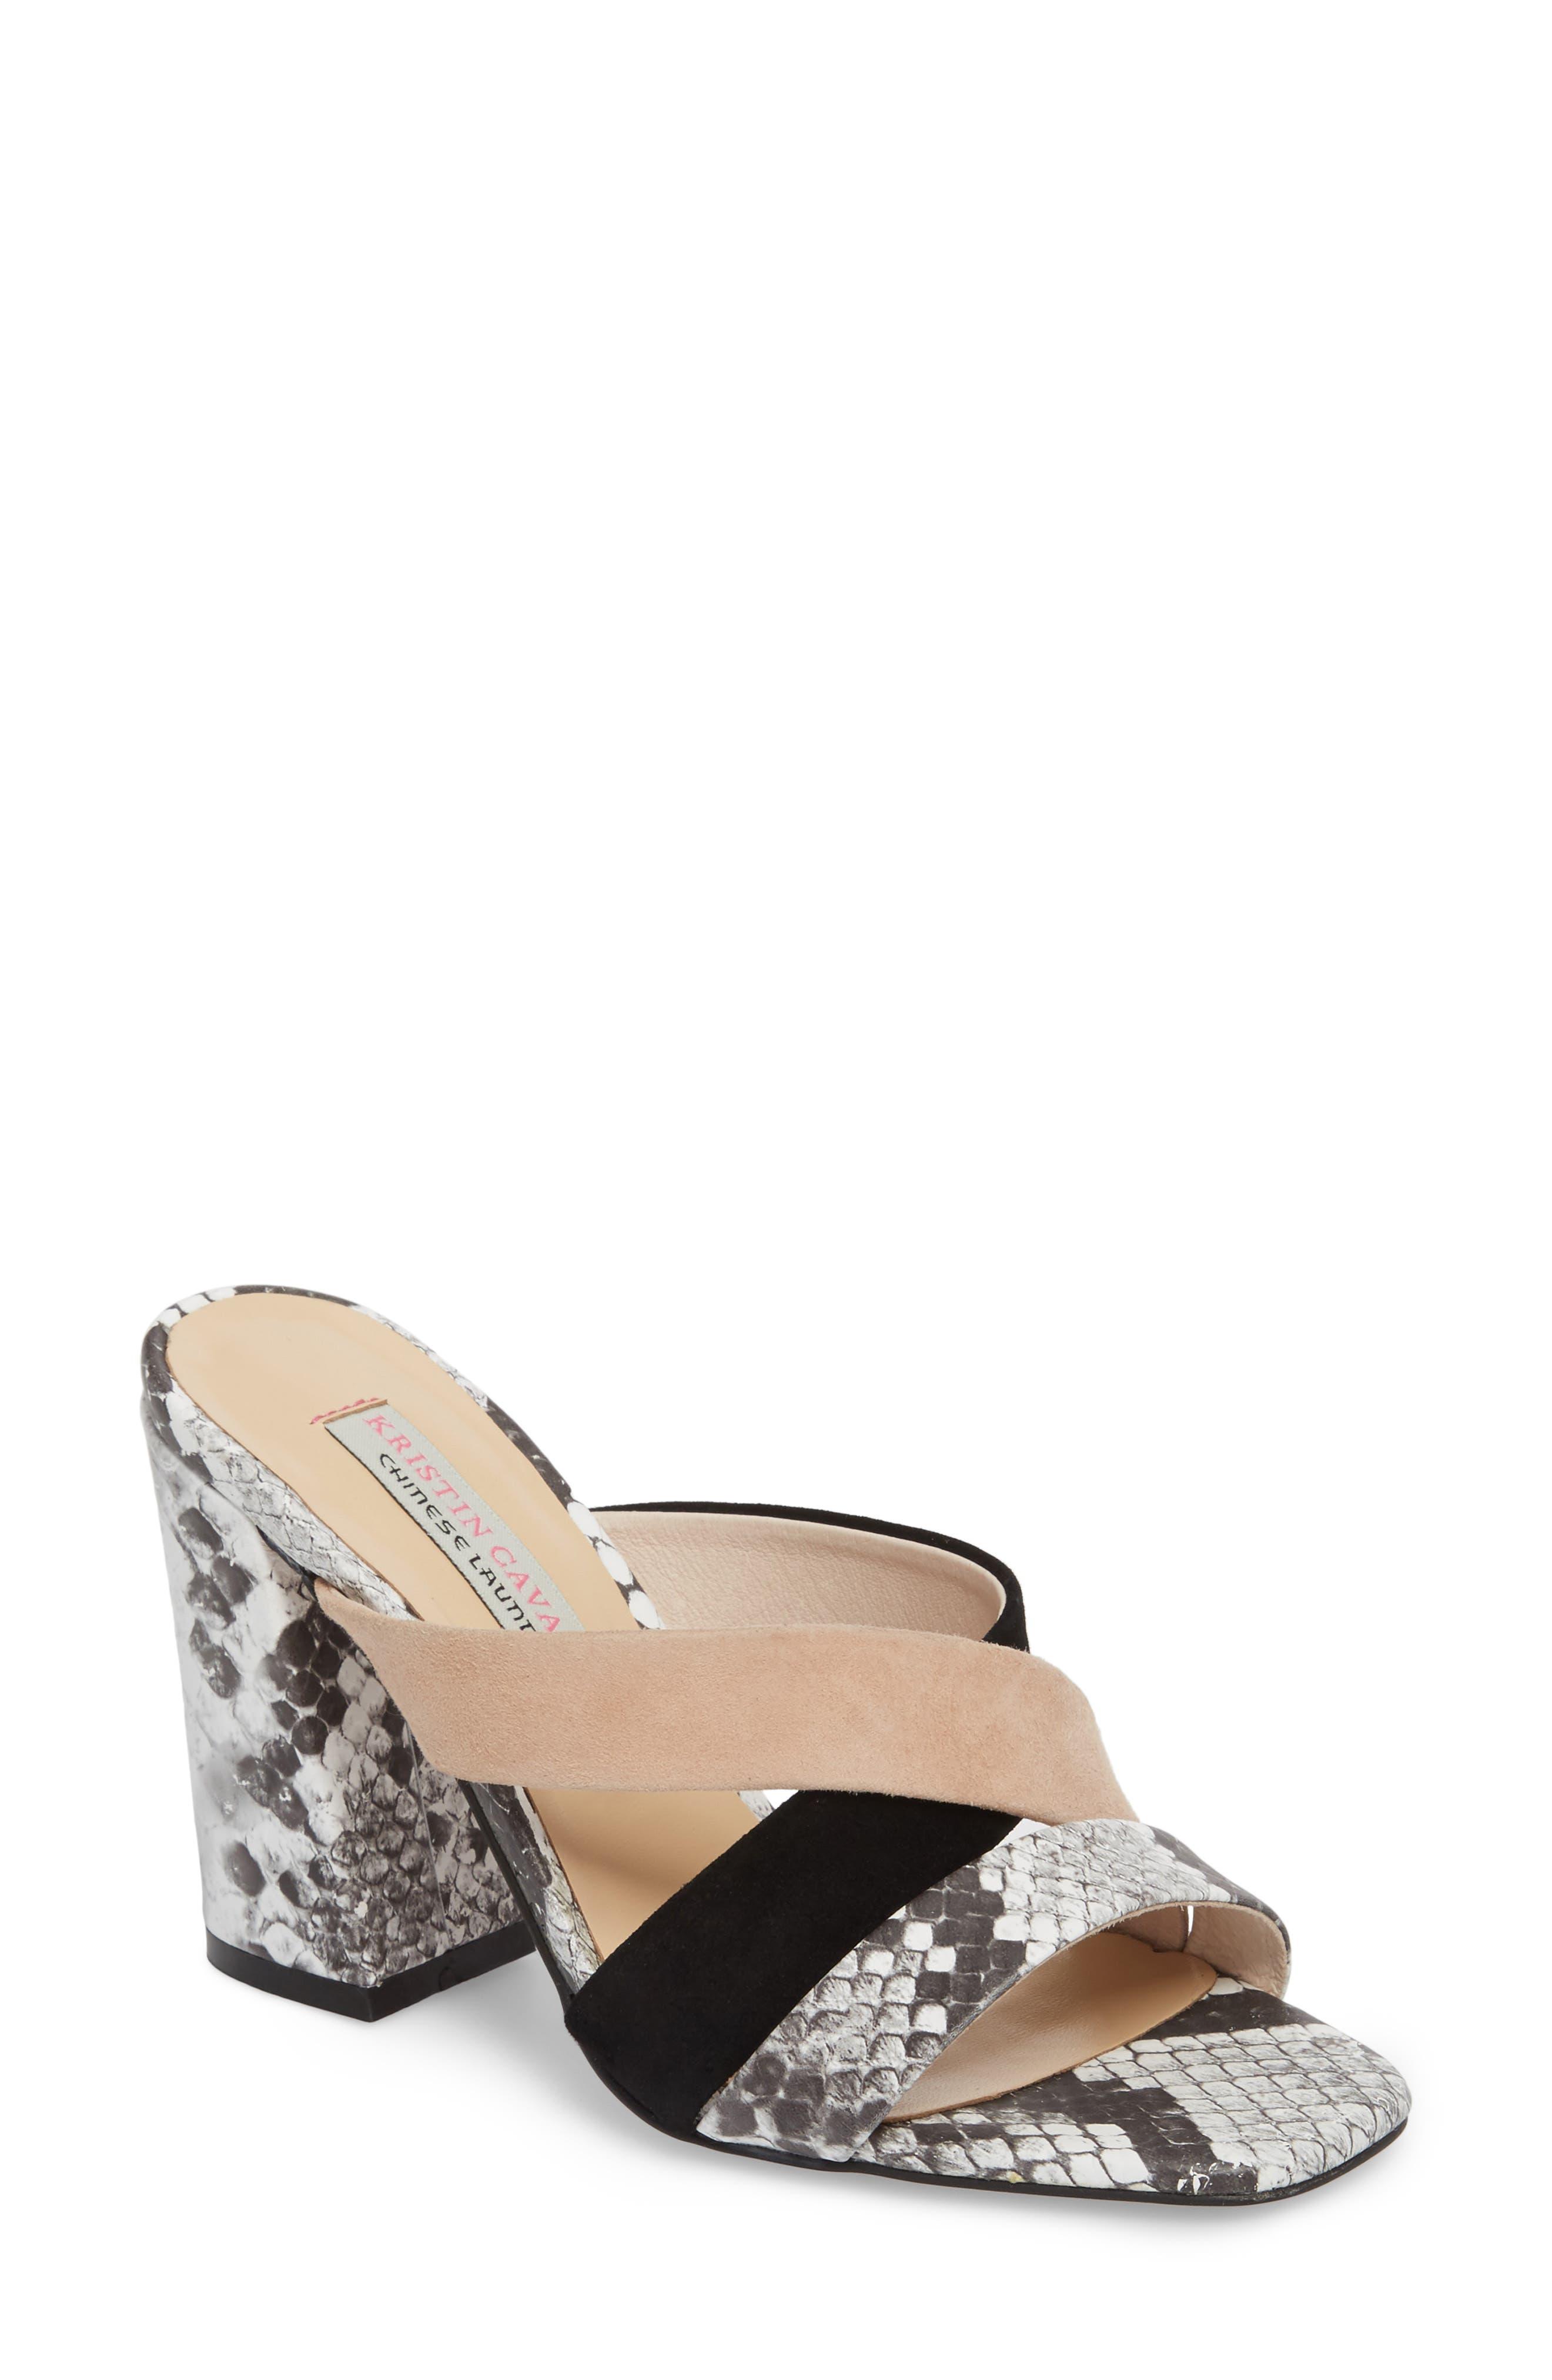 Lola Slide Sandal,                         Main,                         color, Grey/ White Print Leather